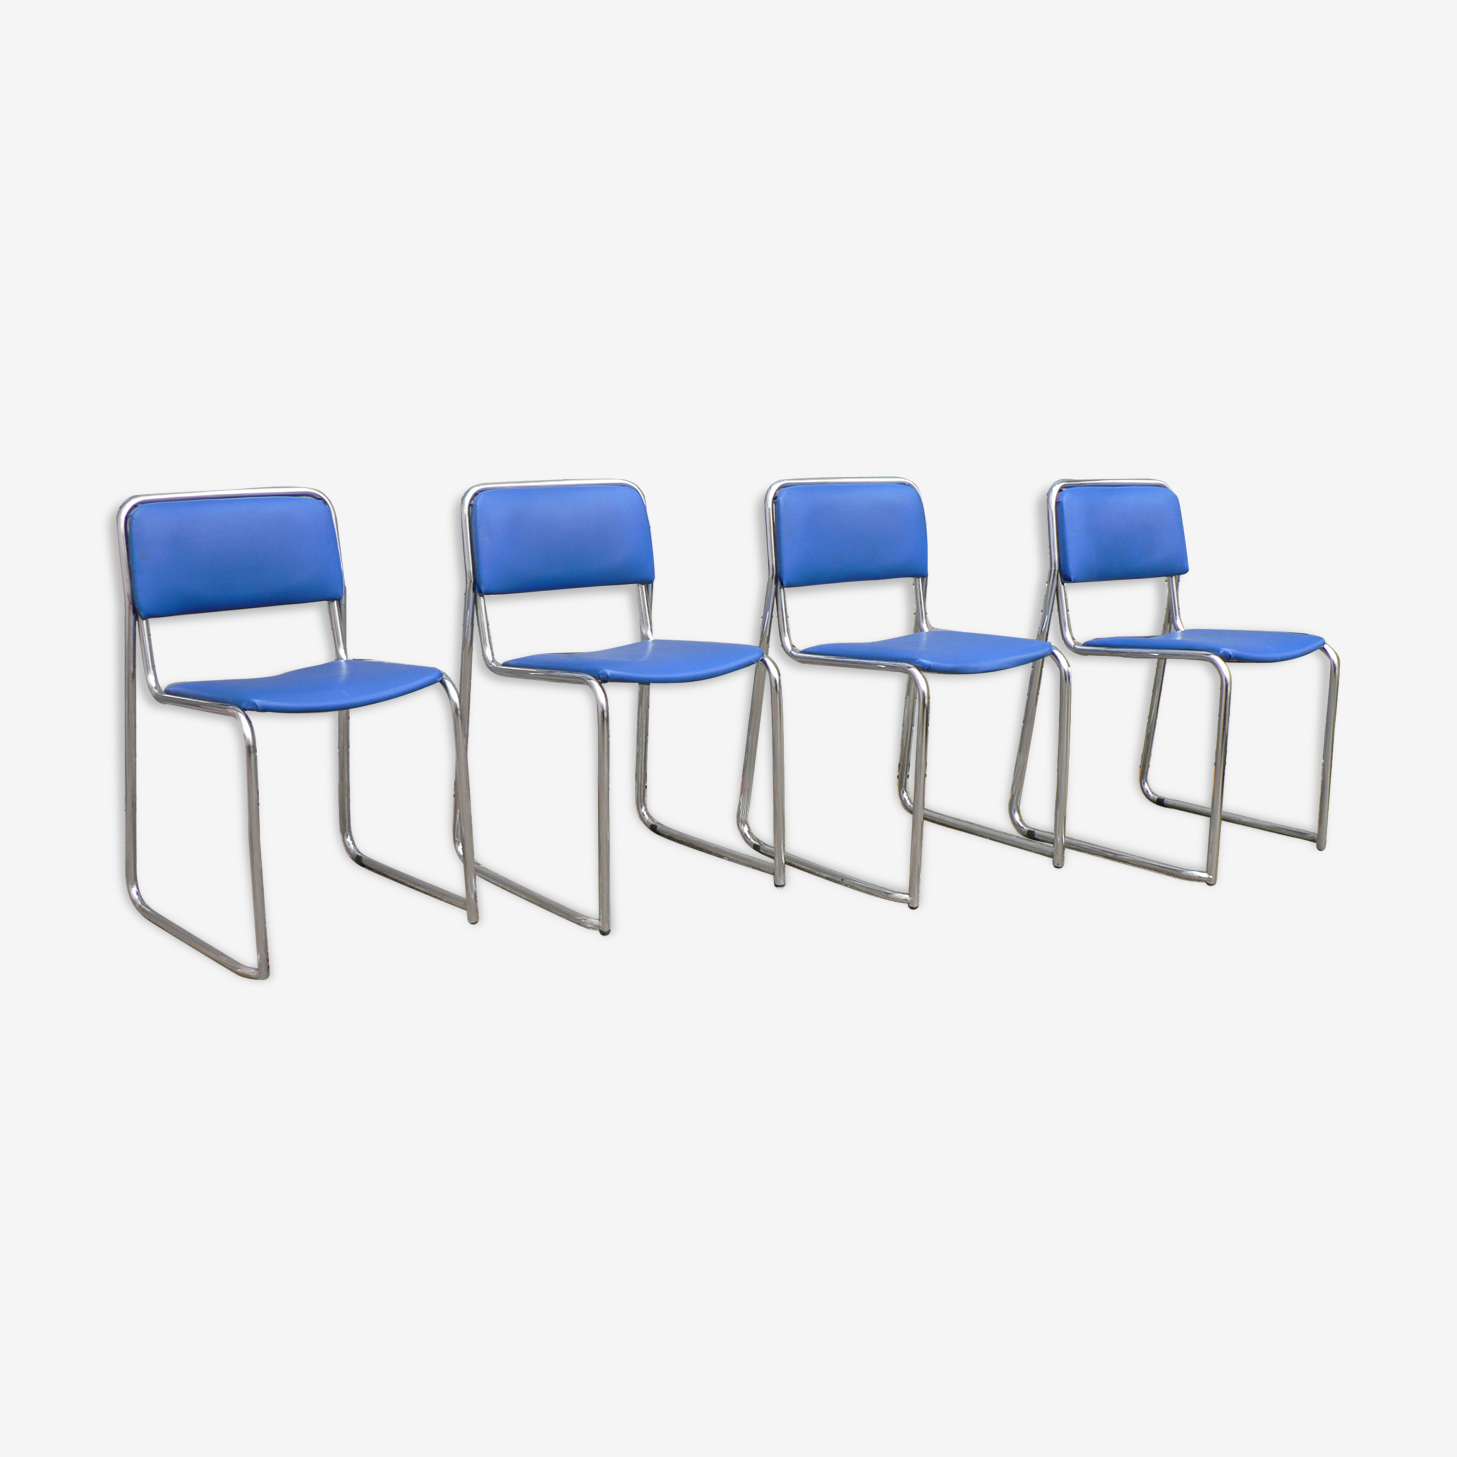 4 chaises vintage empilages